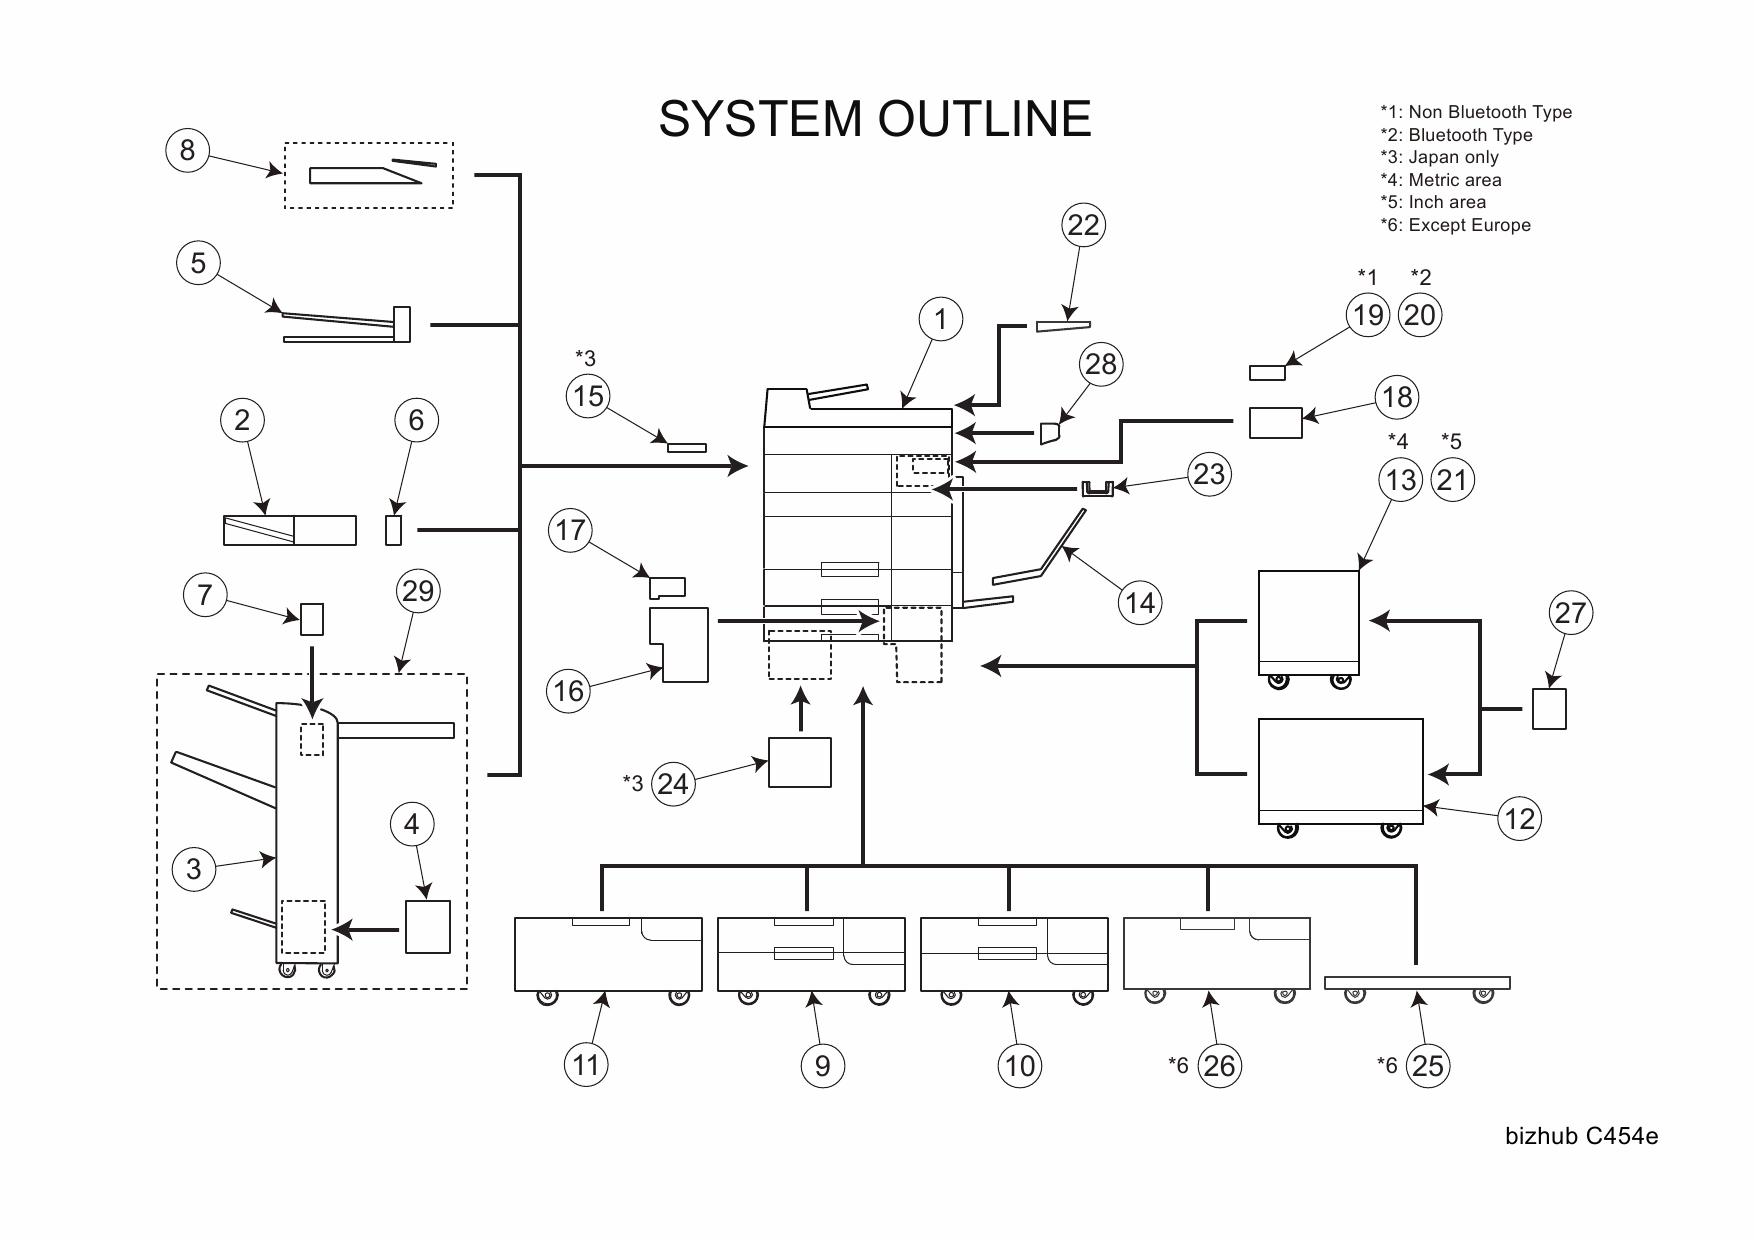 bizhub c454e manual pdf